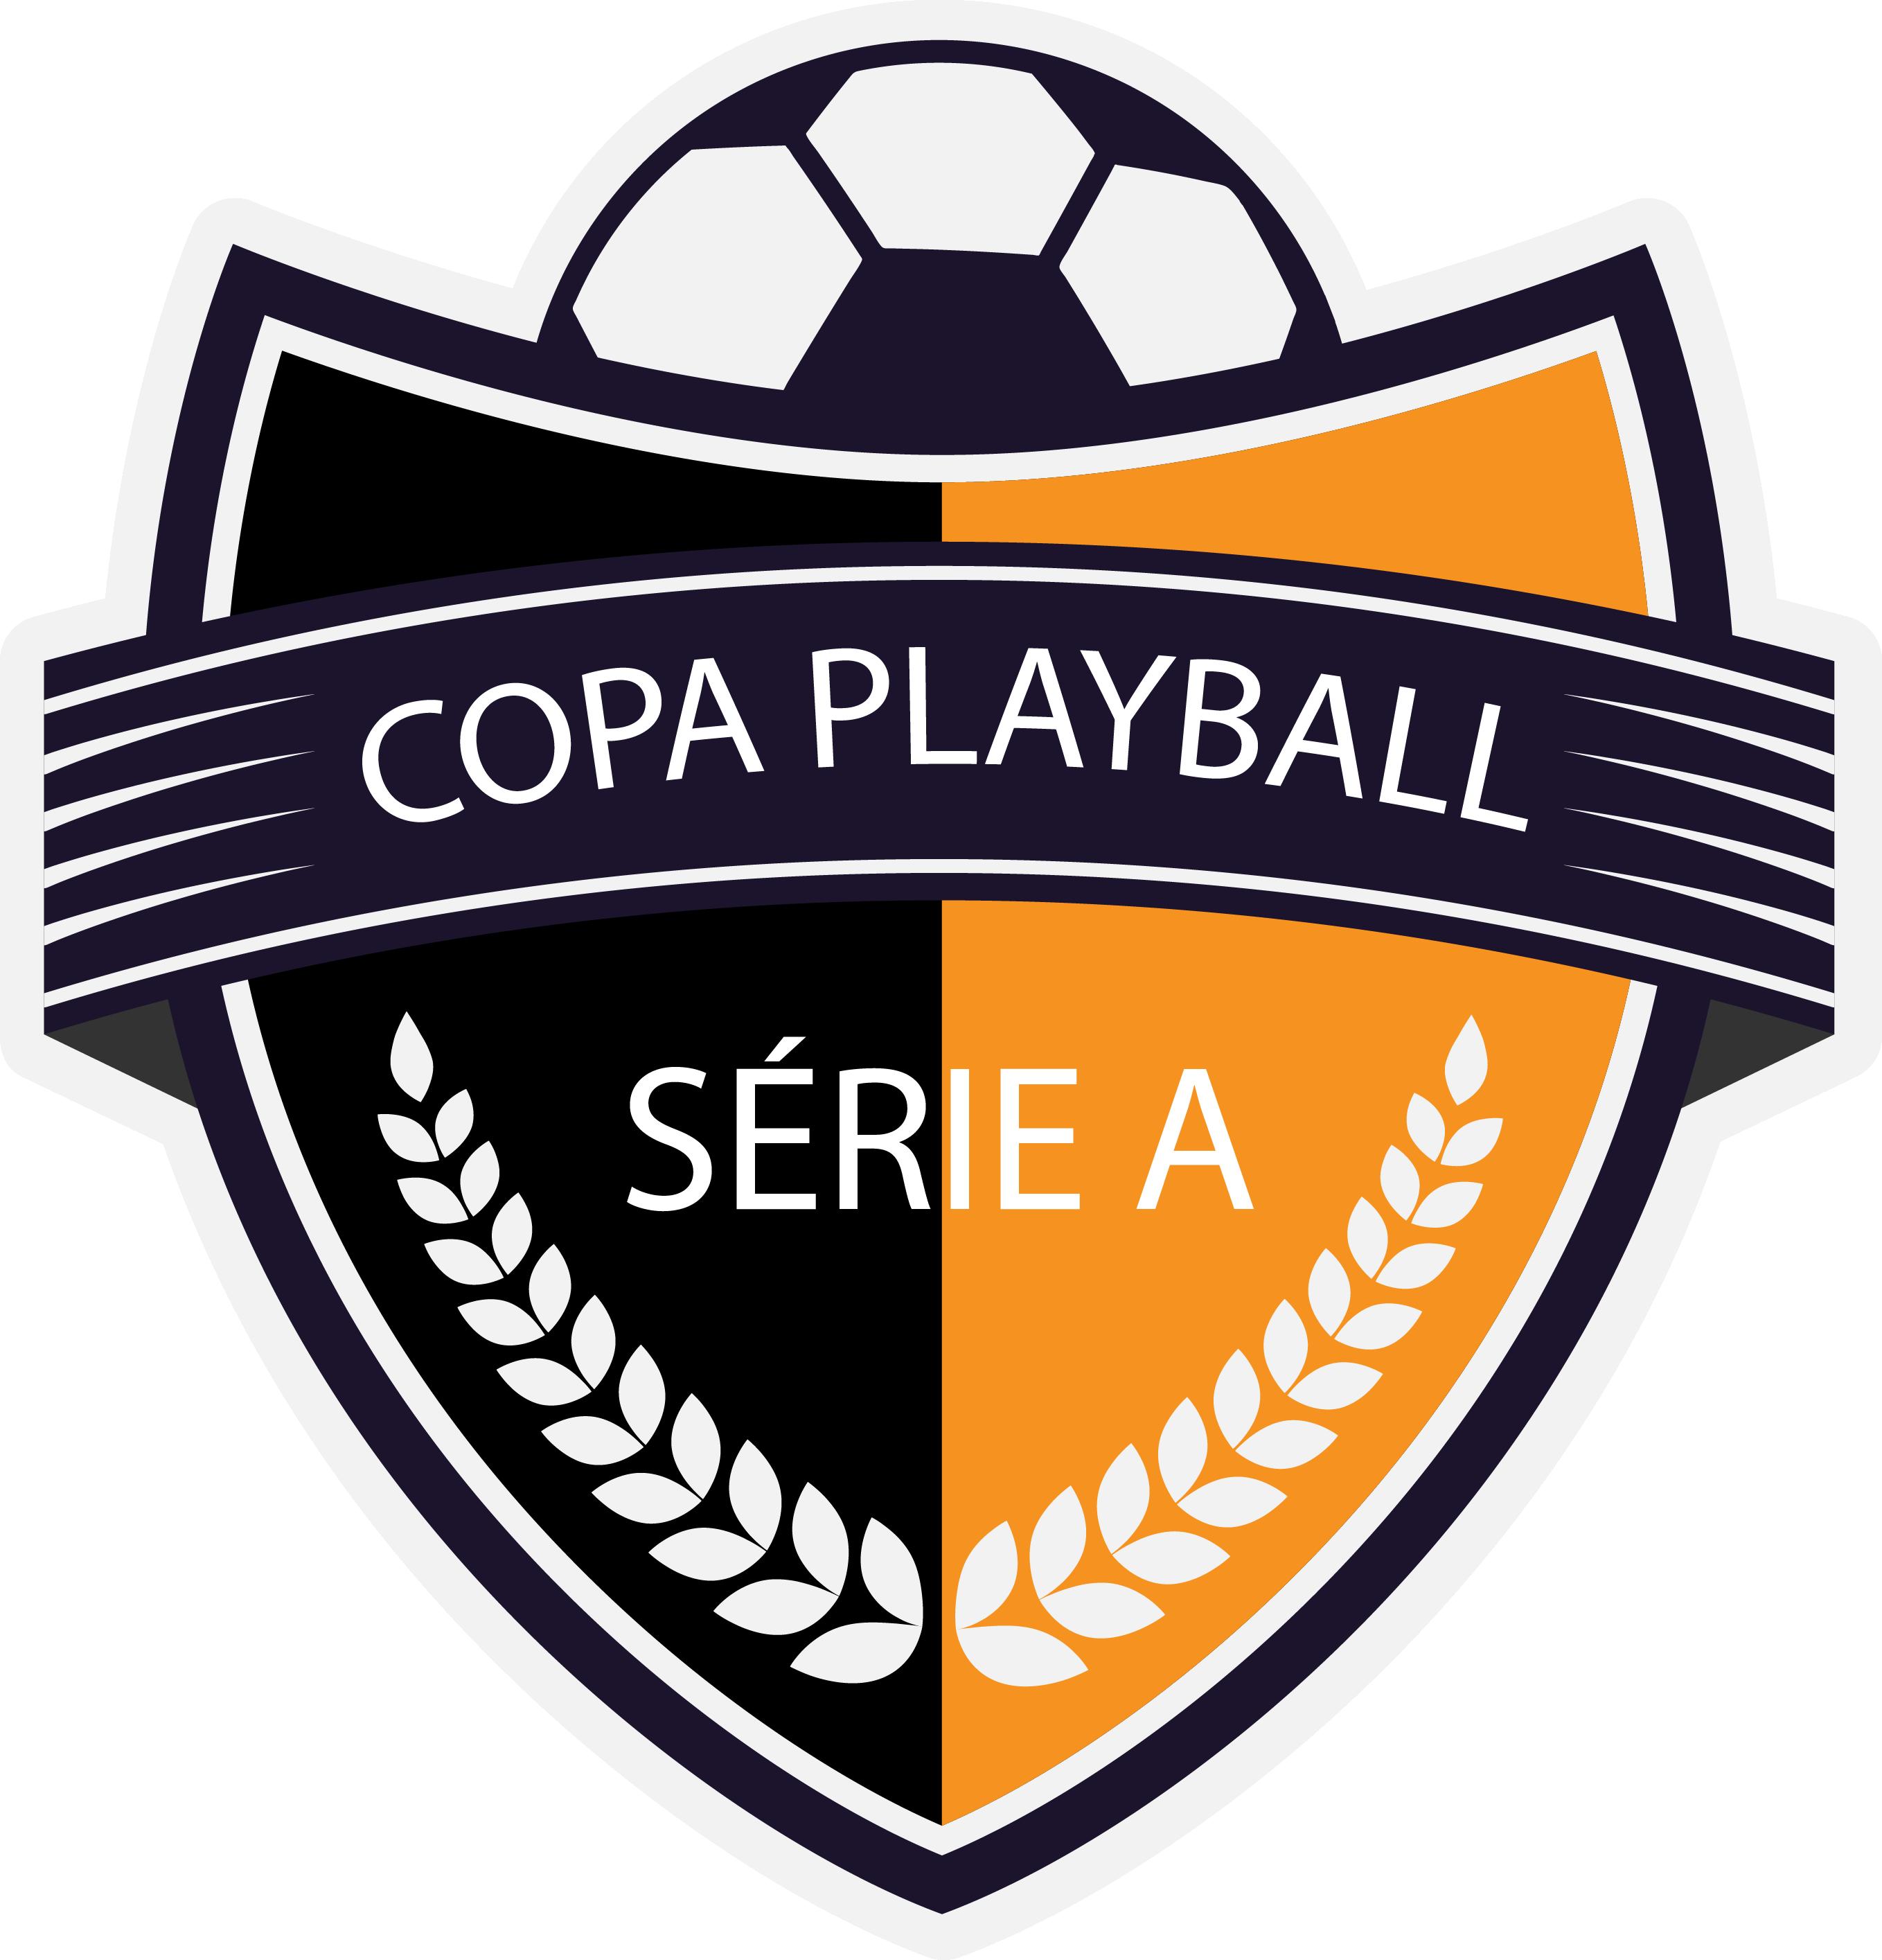 XIII Copa Playball Pompeia Série A